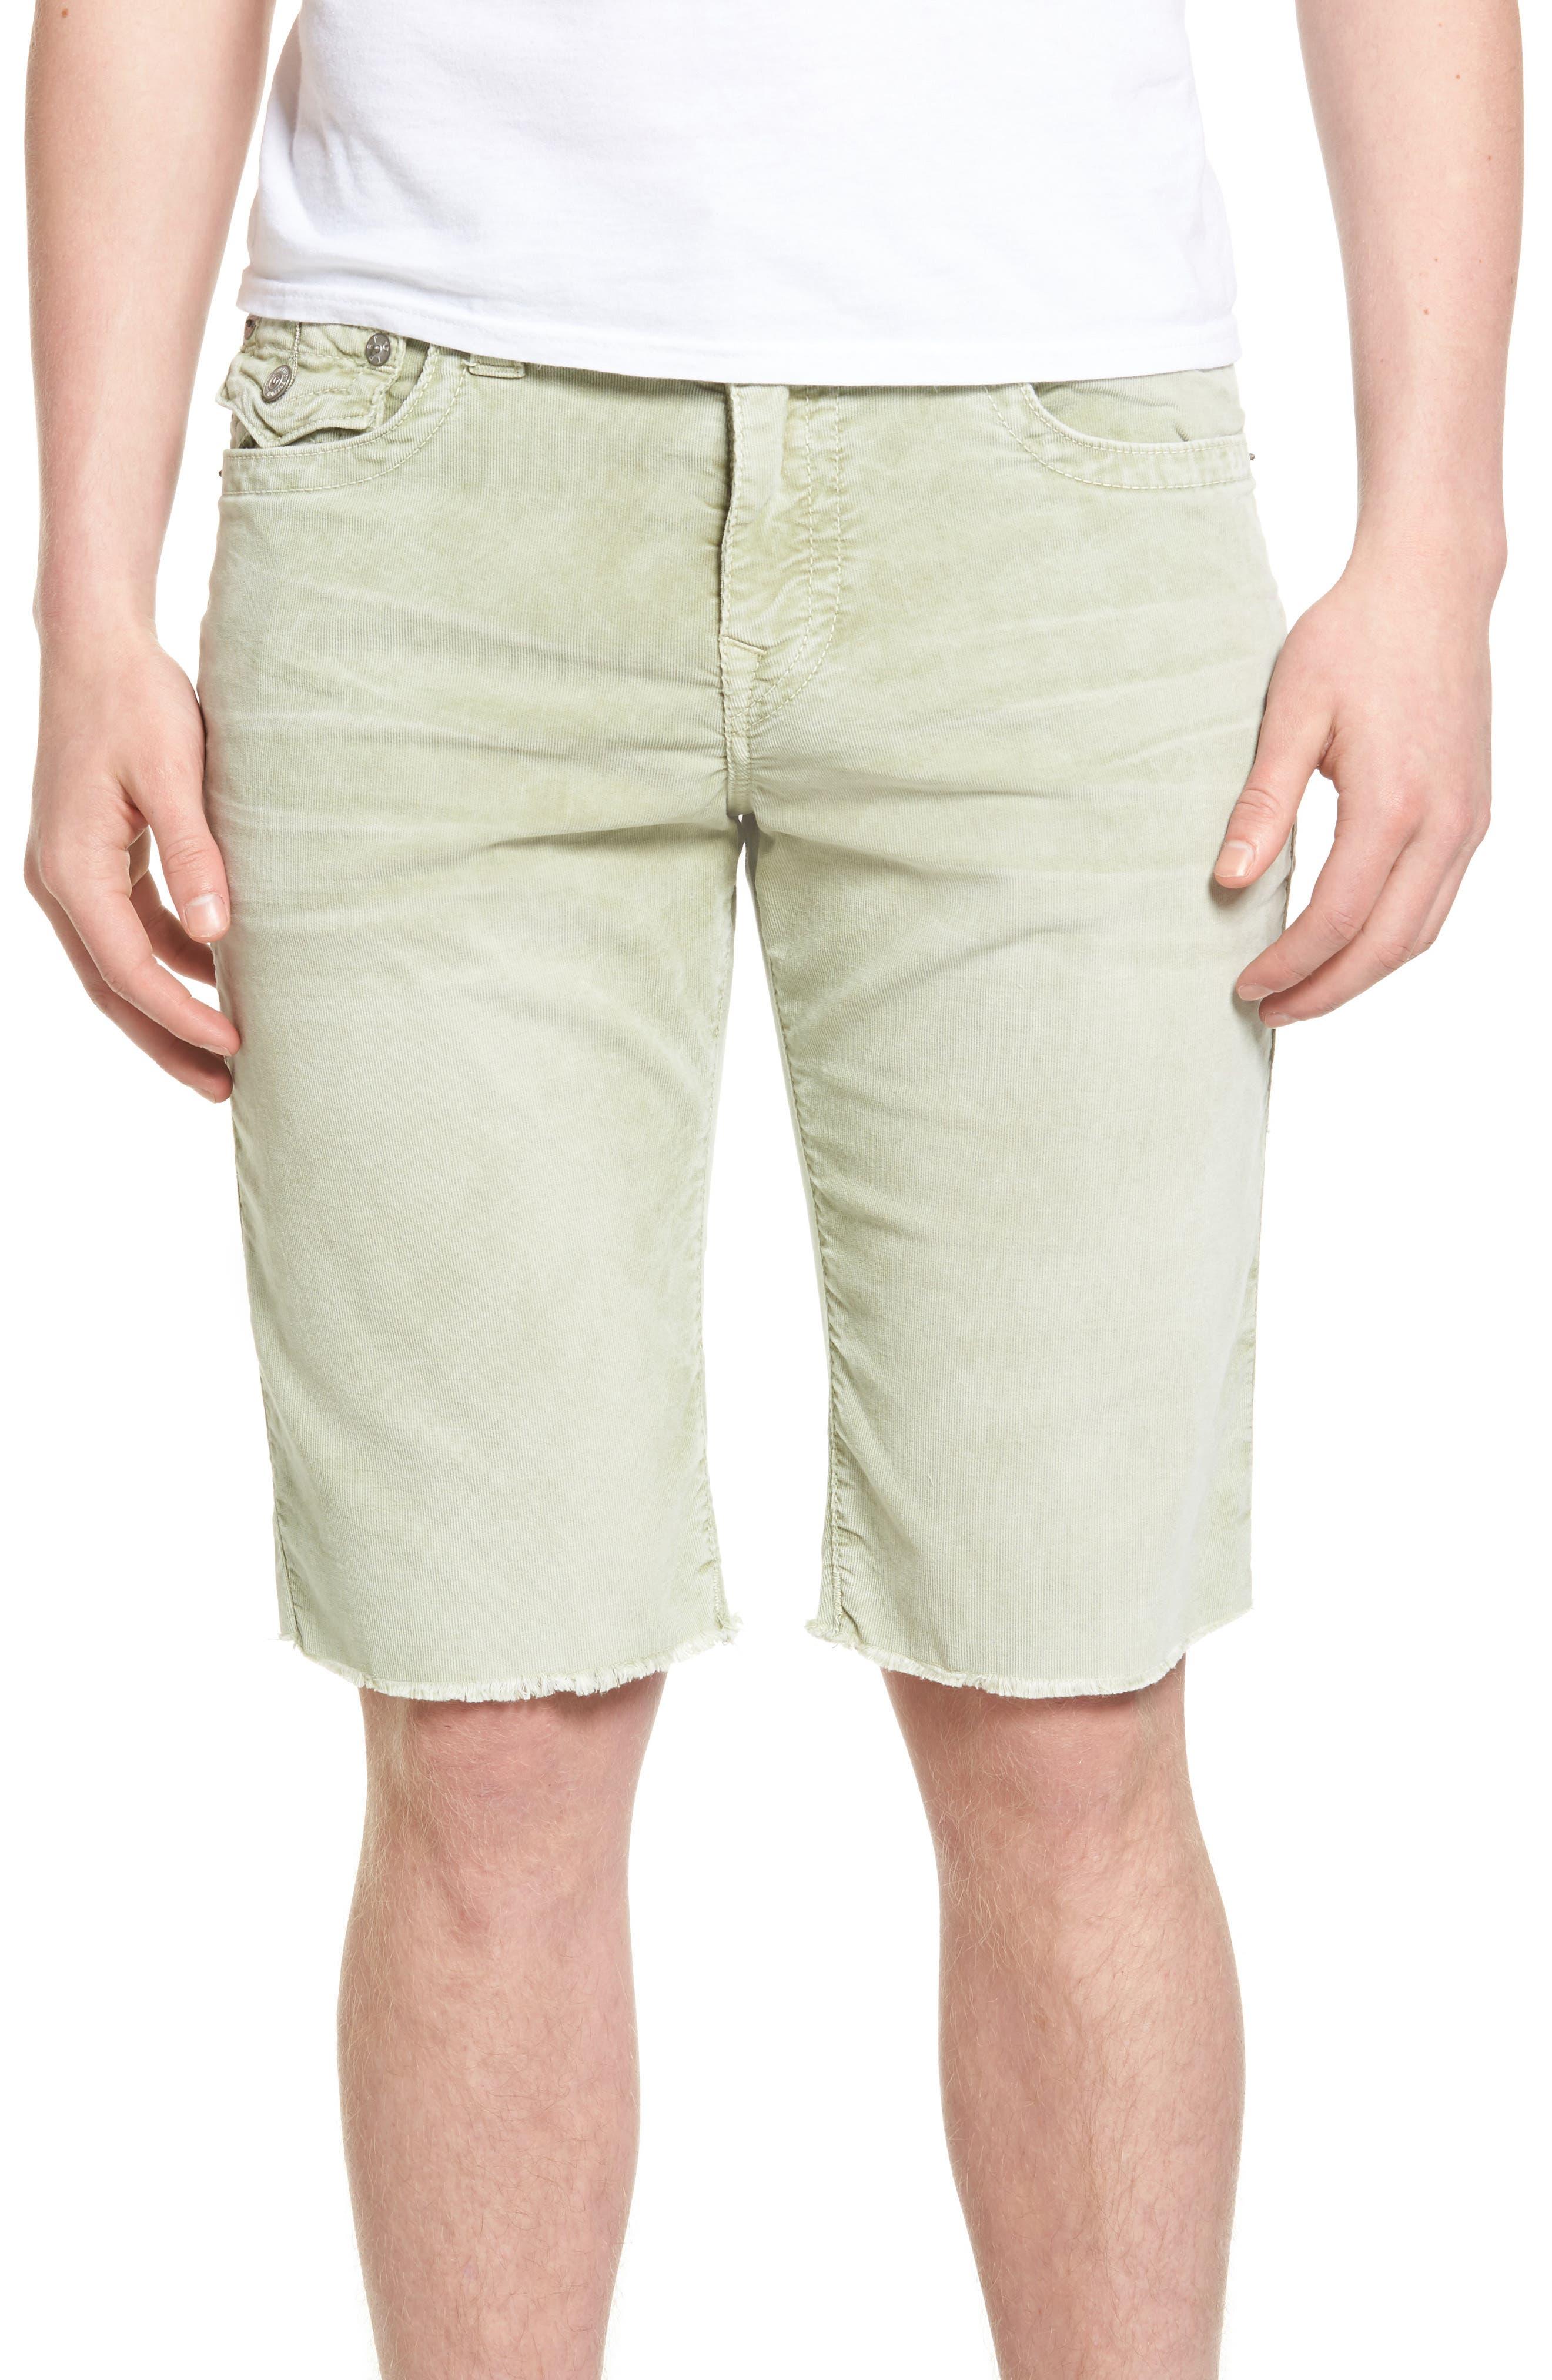 True Religion Brand Jeans Ricky Flap Corduroy Shorts (Regular & Big)